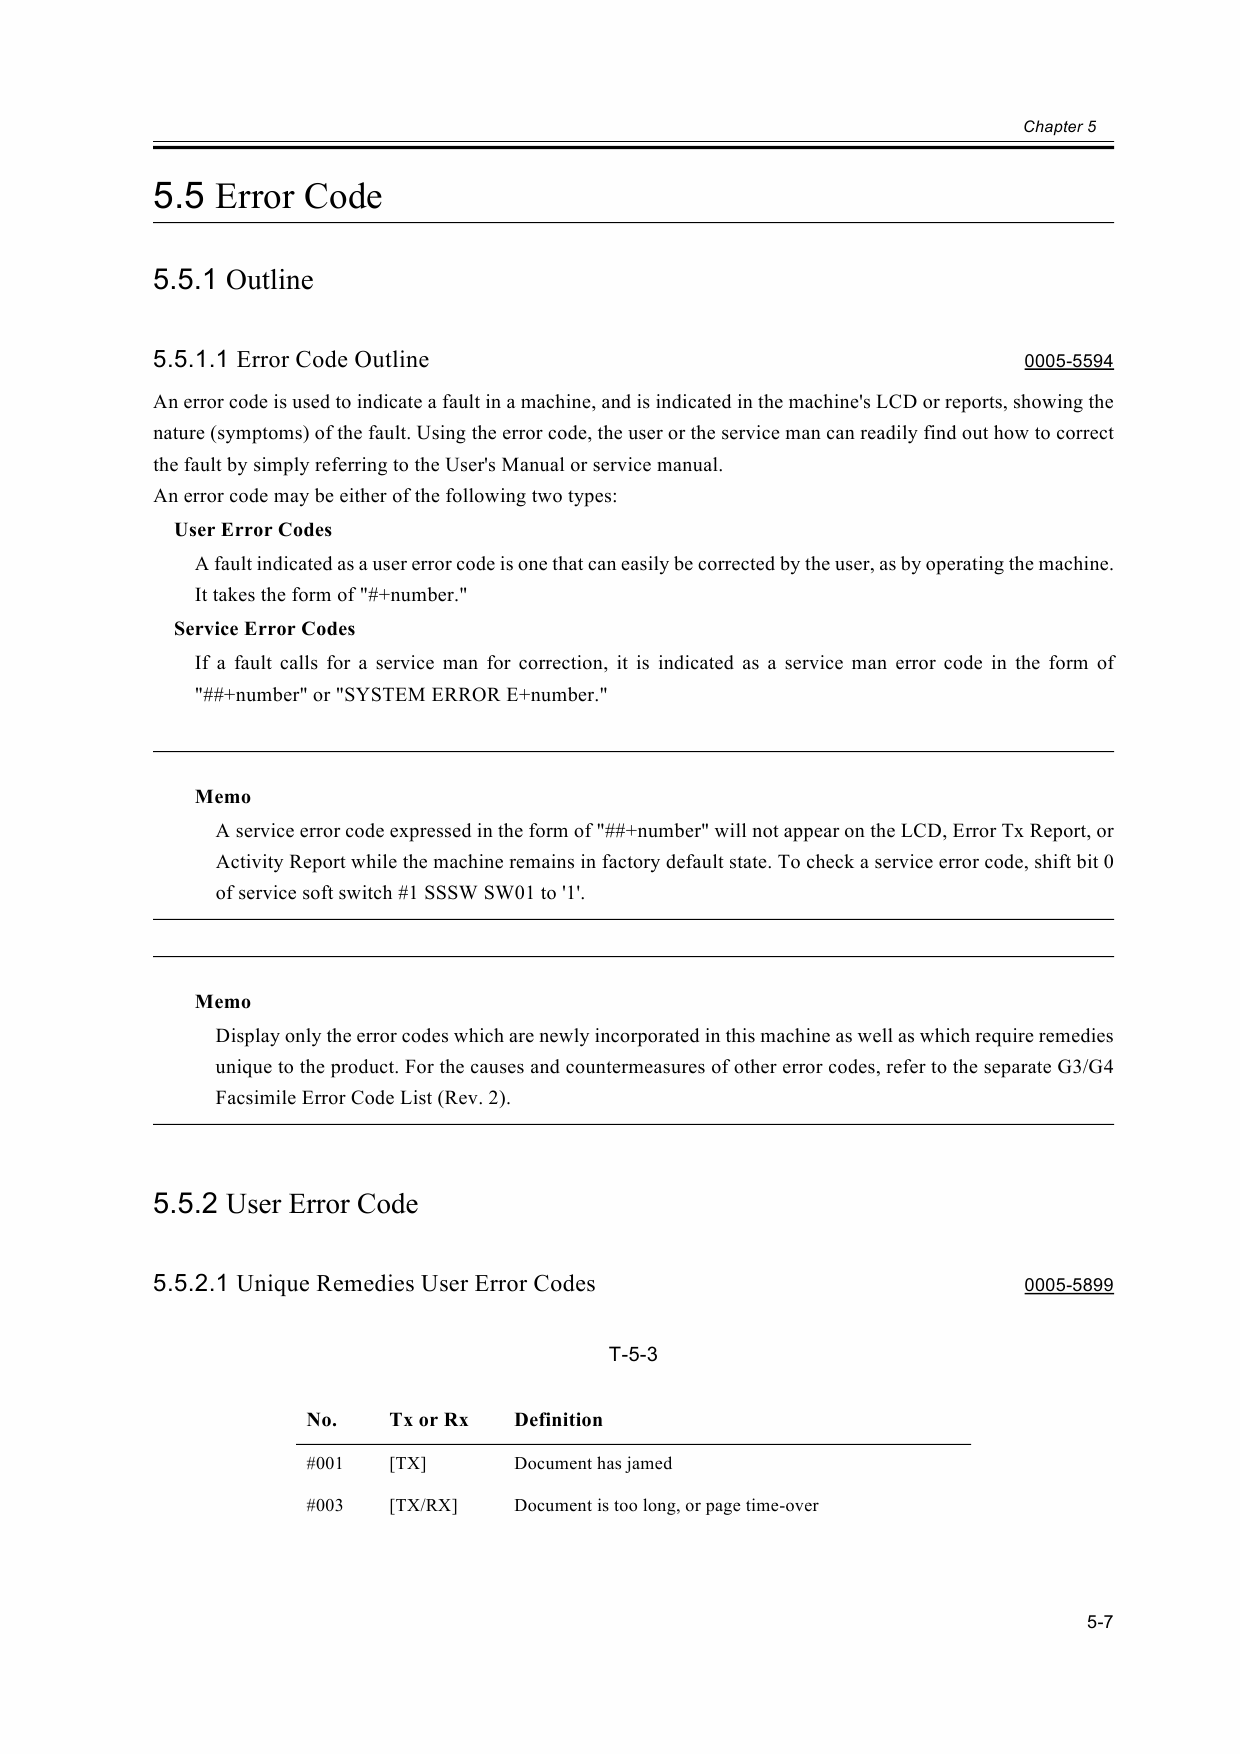 canon fax l380 parts and service manual